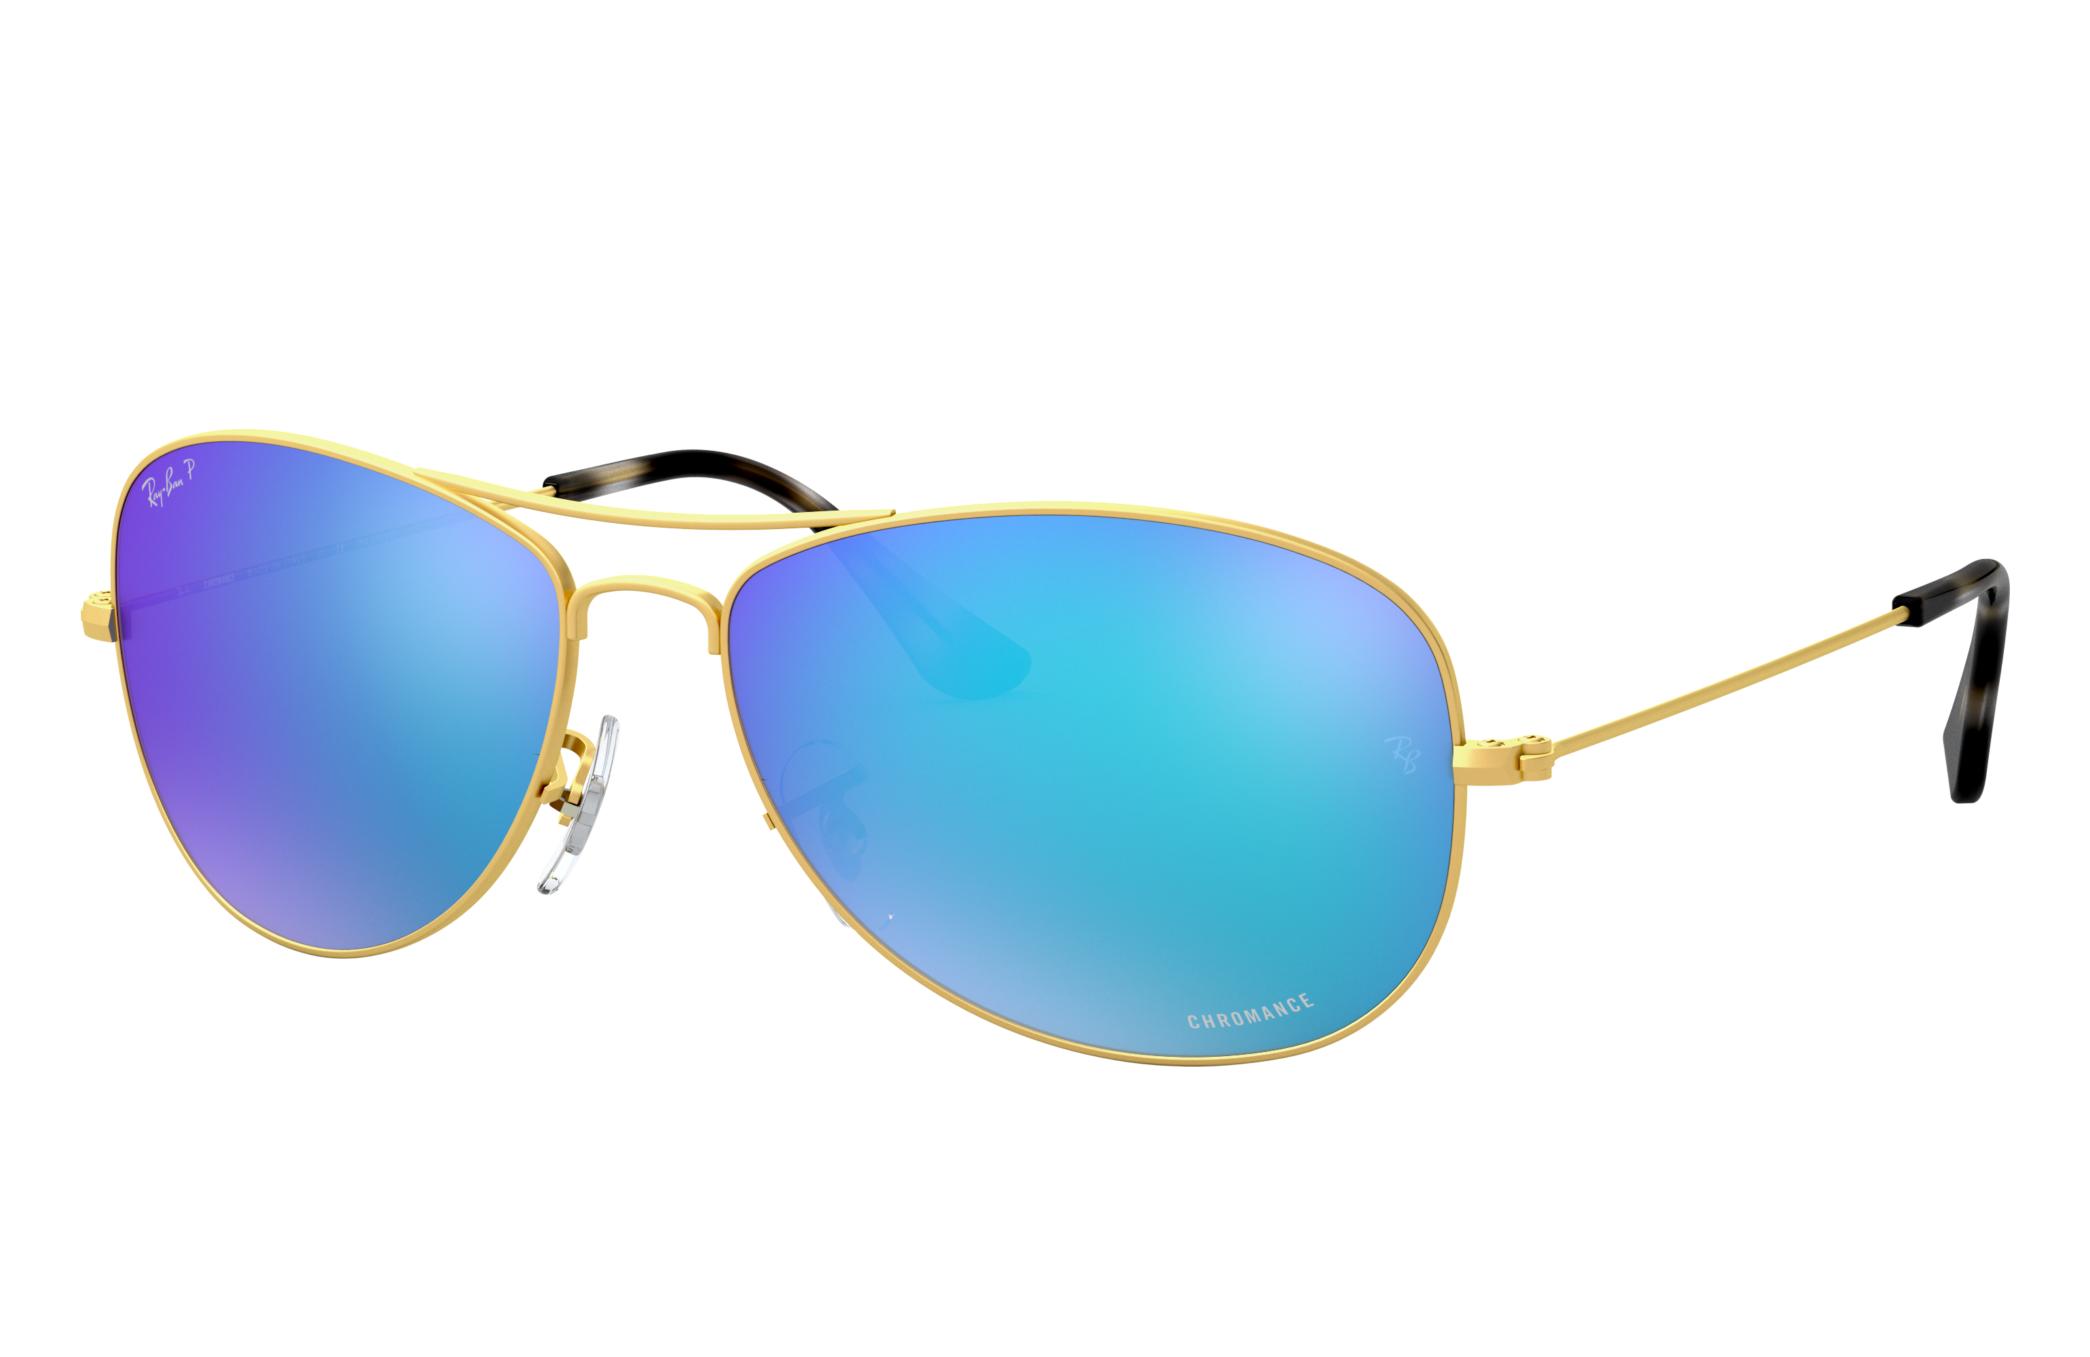 Ray-Ban Rb3562 Chromance Gold, Polarized Blue Lenses - RB3562